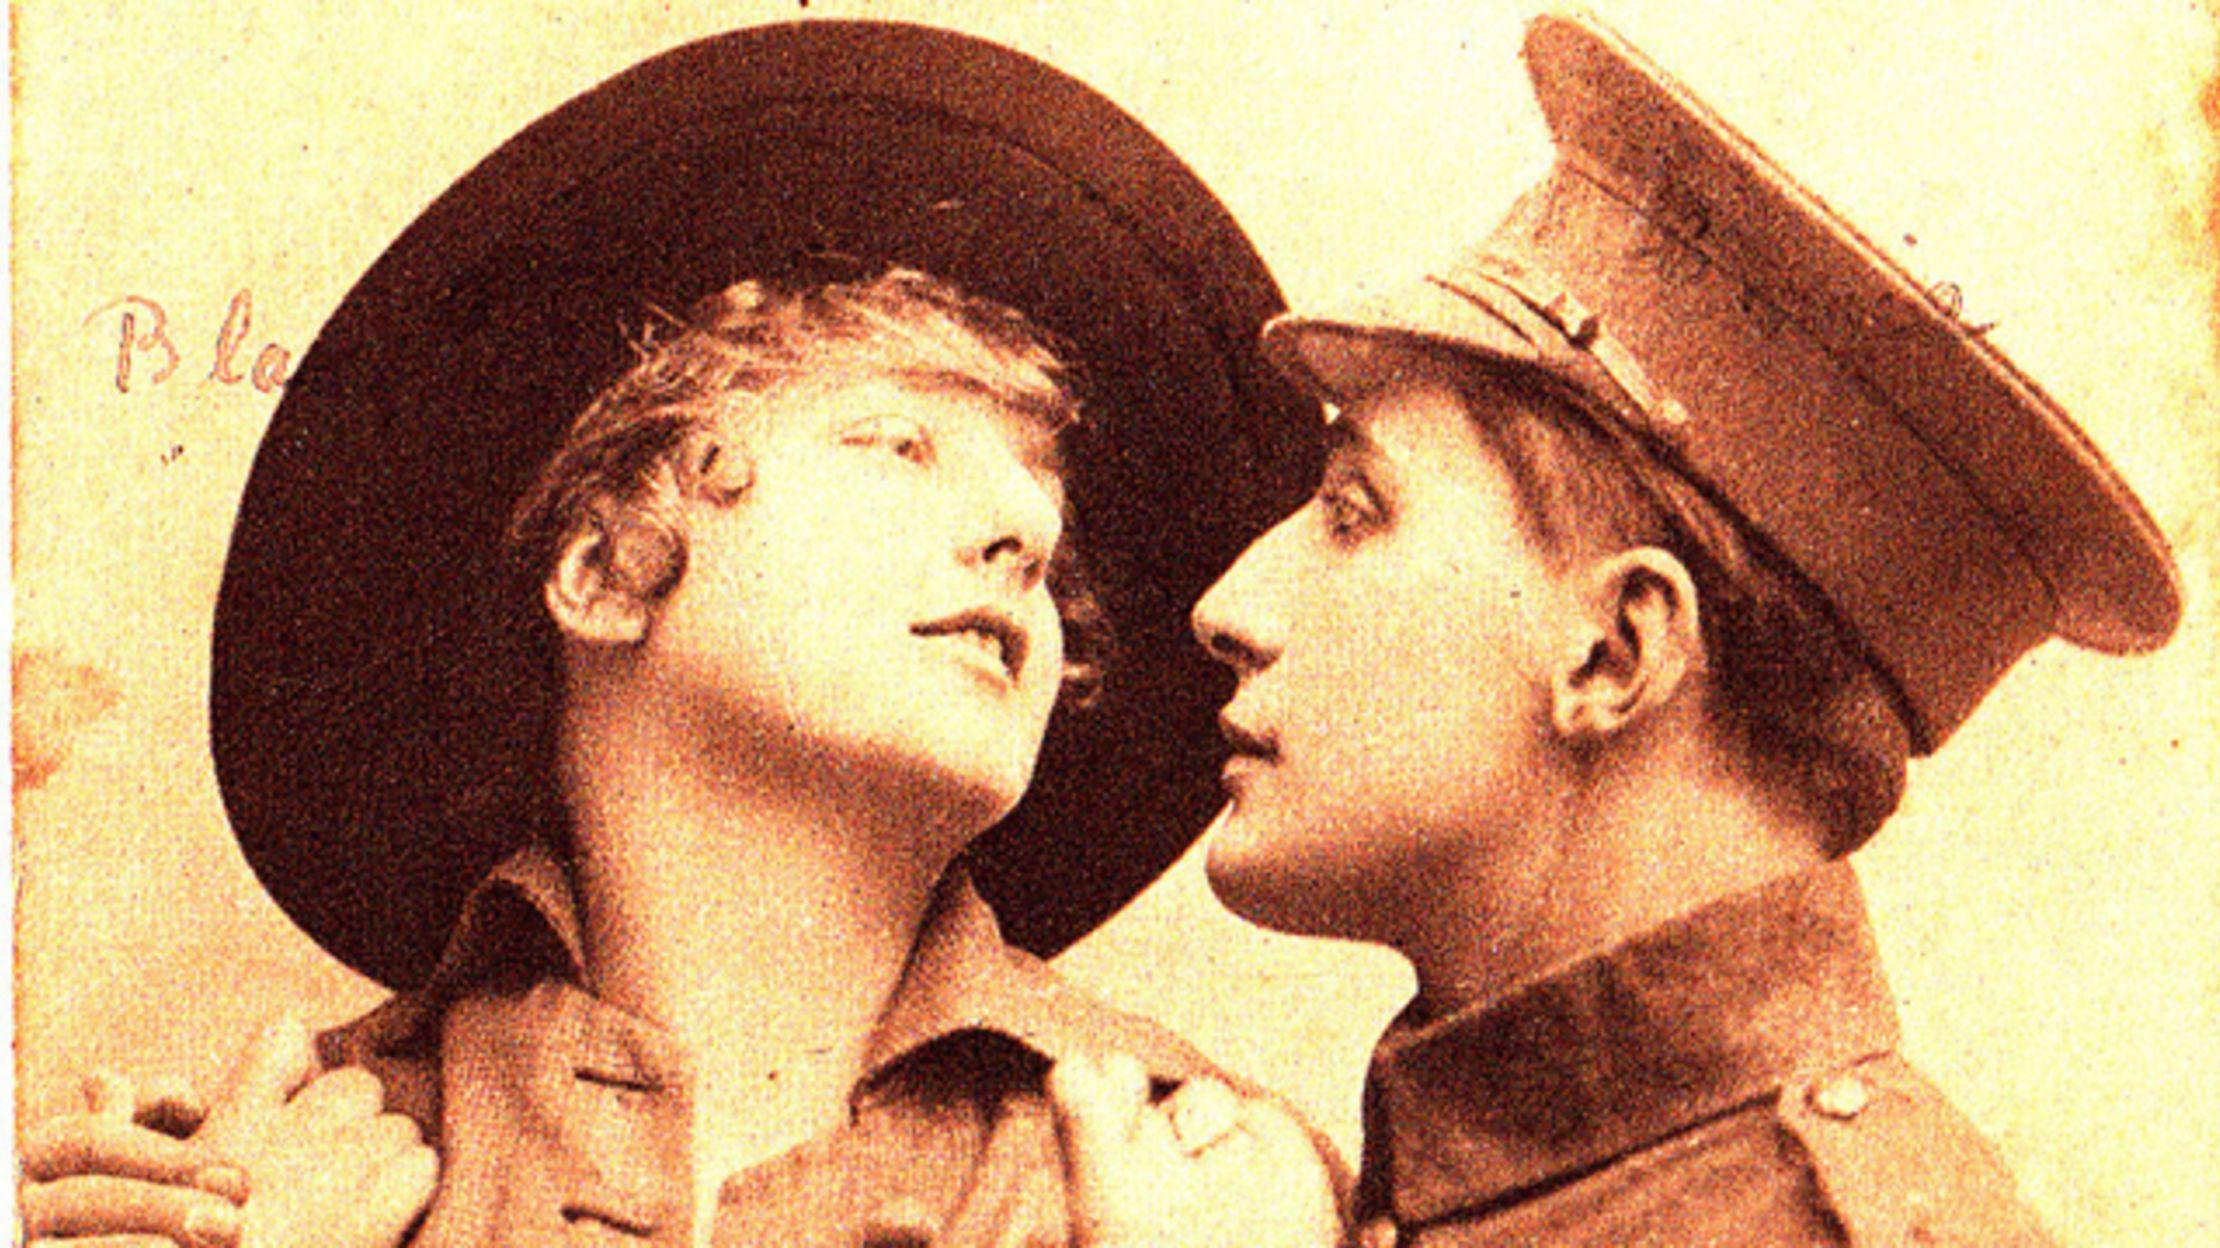 Help Digitize History by Transcribing World War I-Era Love Letters